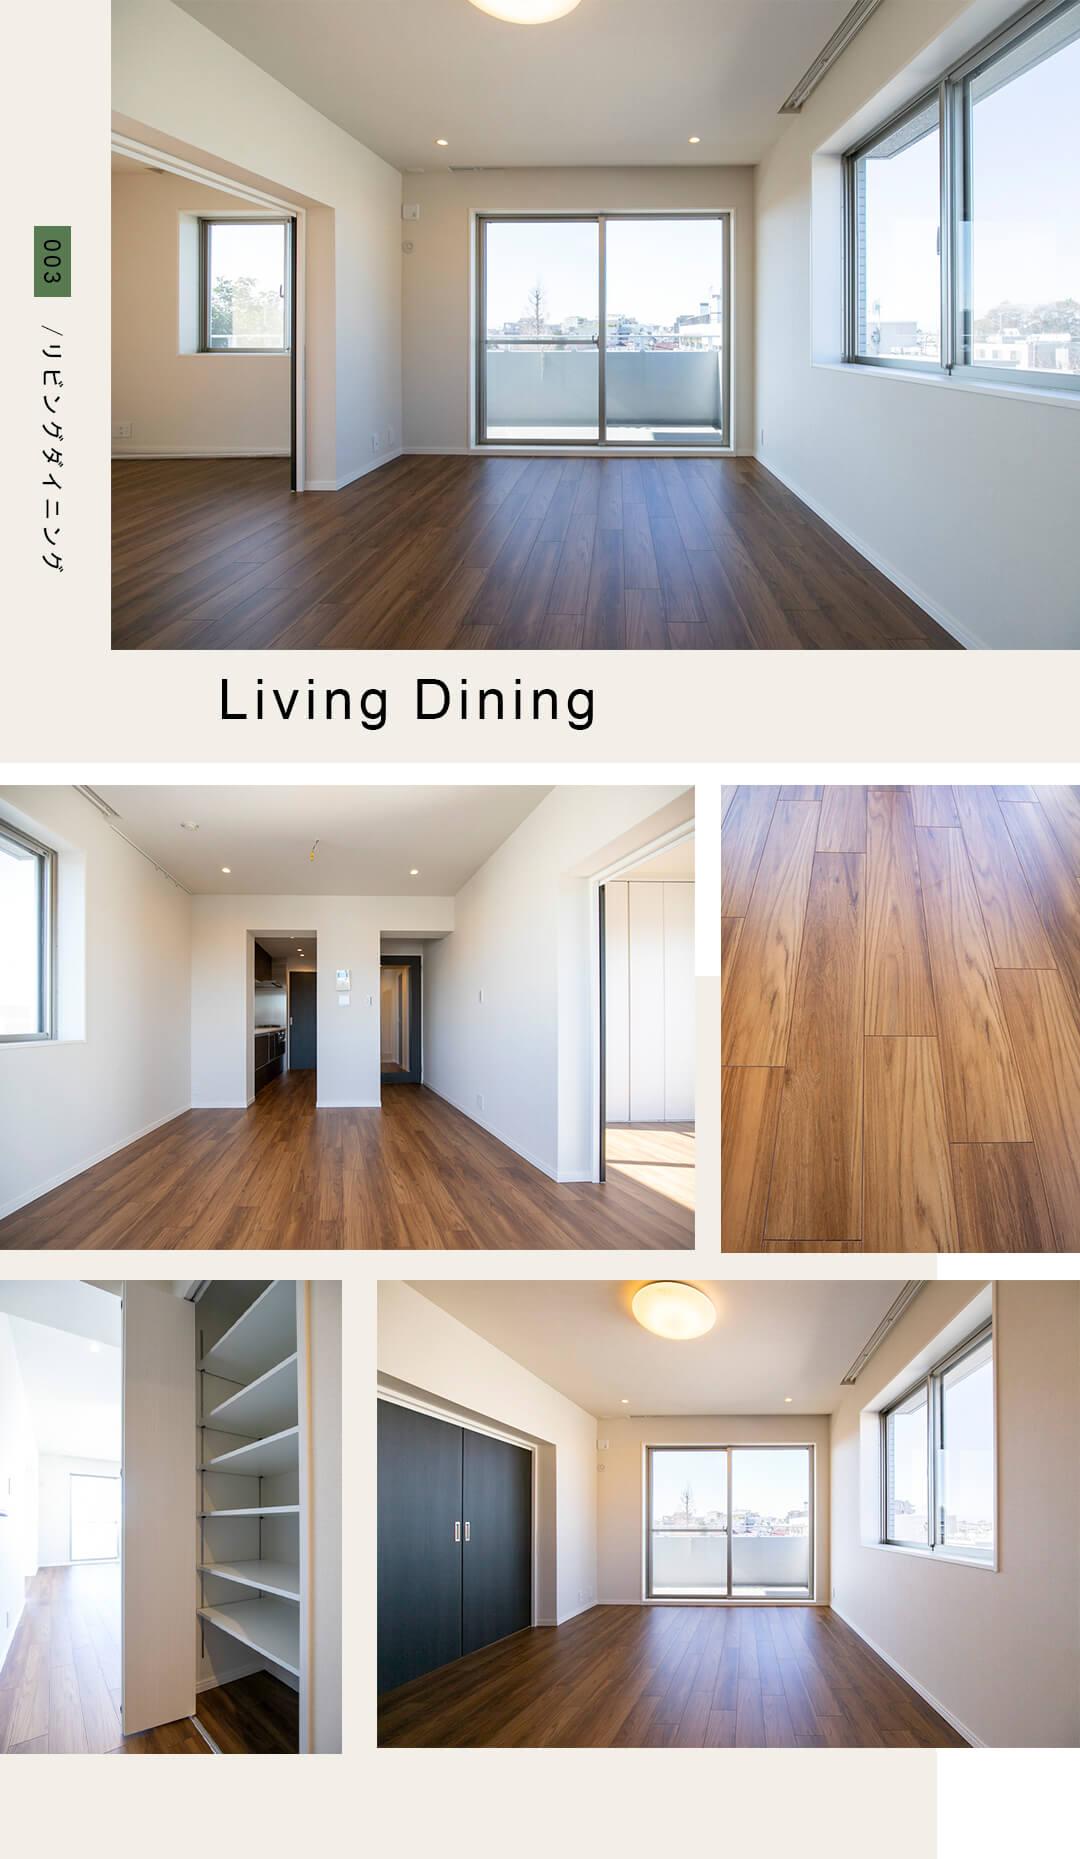 003,Livingdining,リビングダイニング